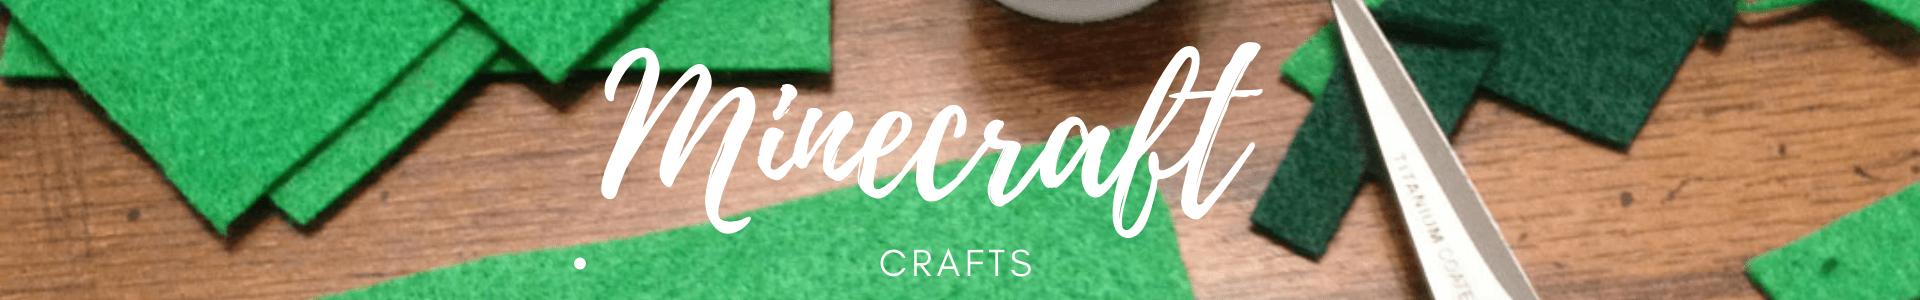 blocks of green felt and scissors